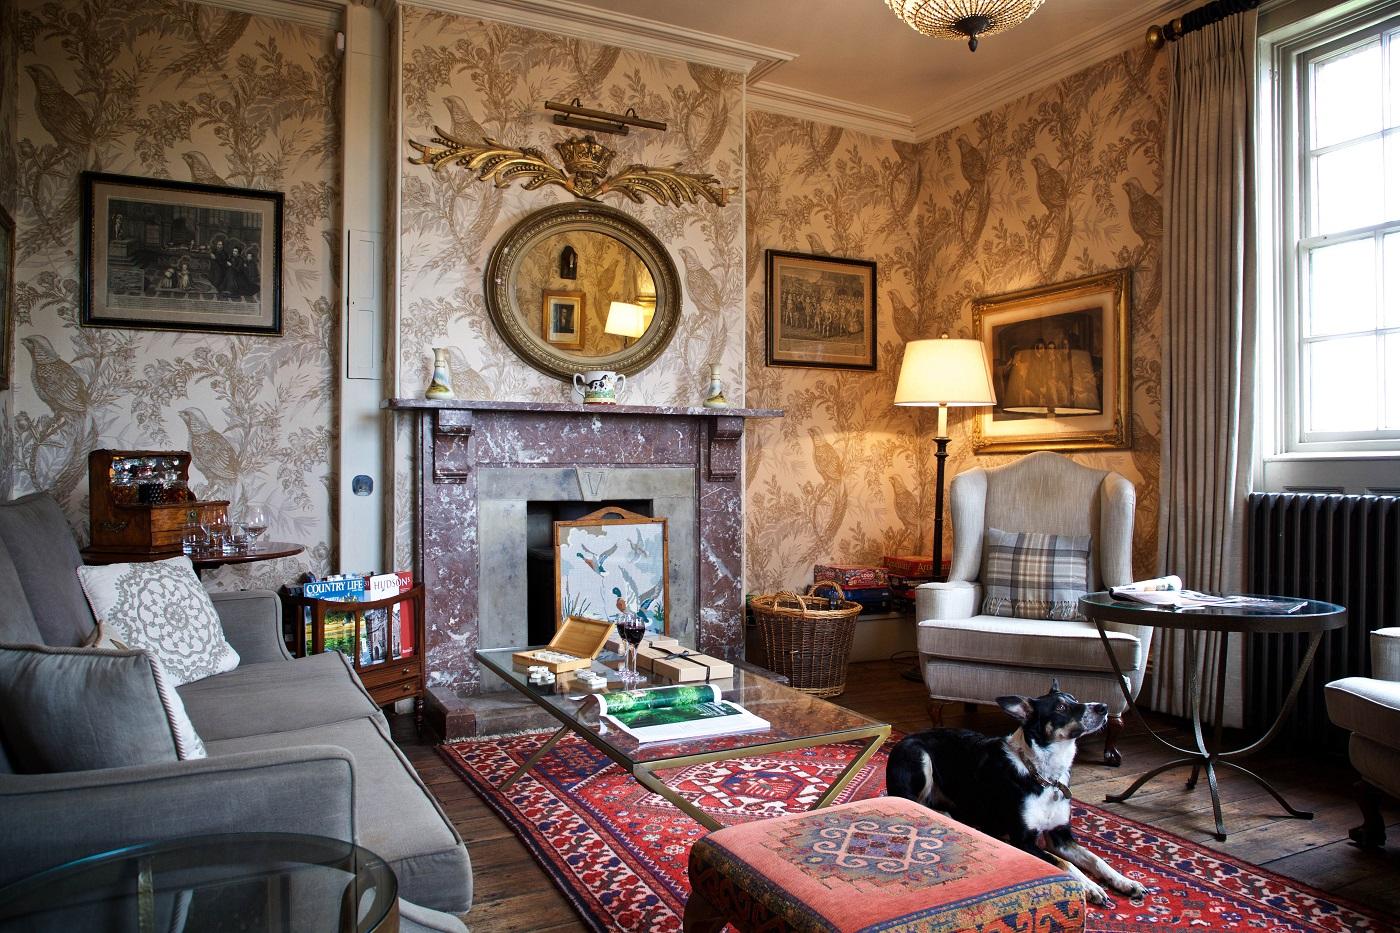 The Victoria Inn lounge